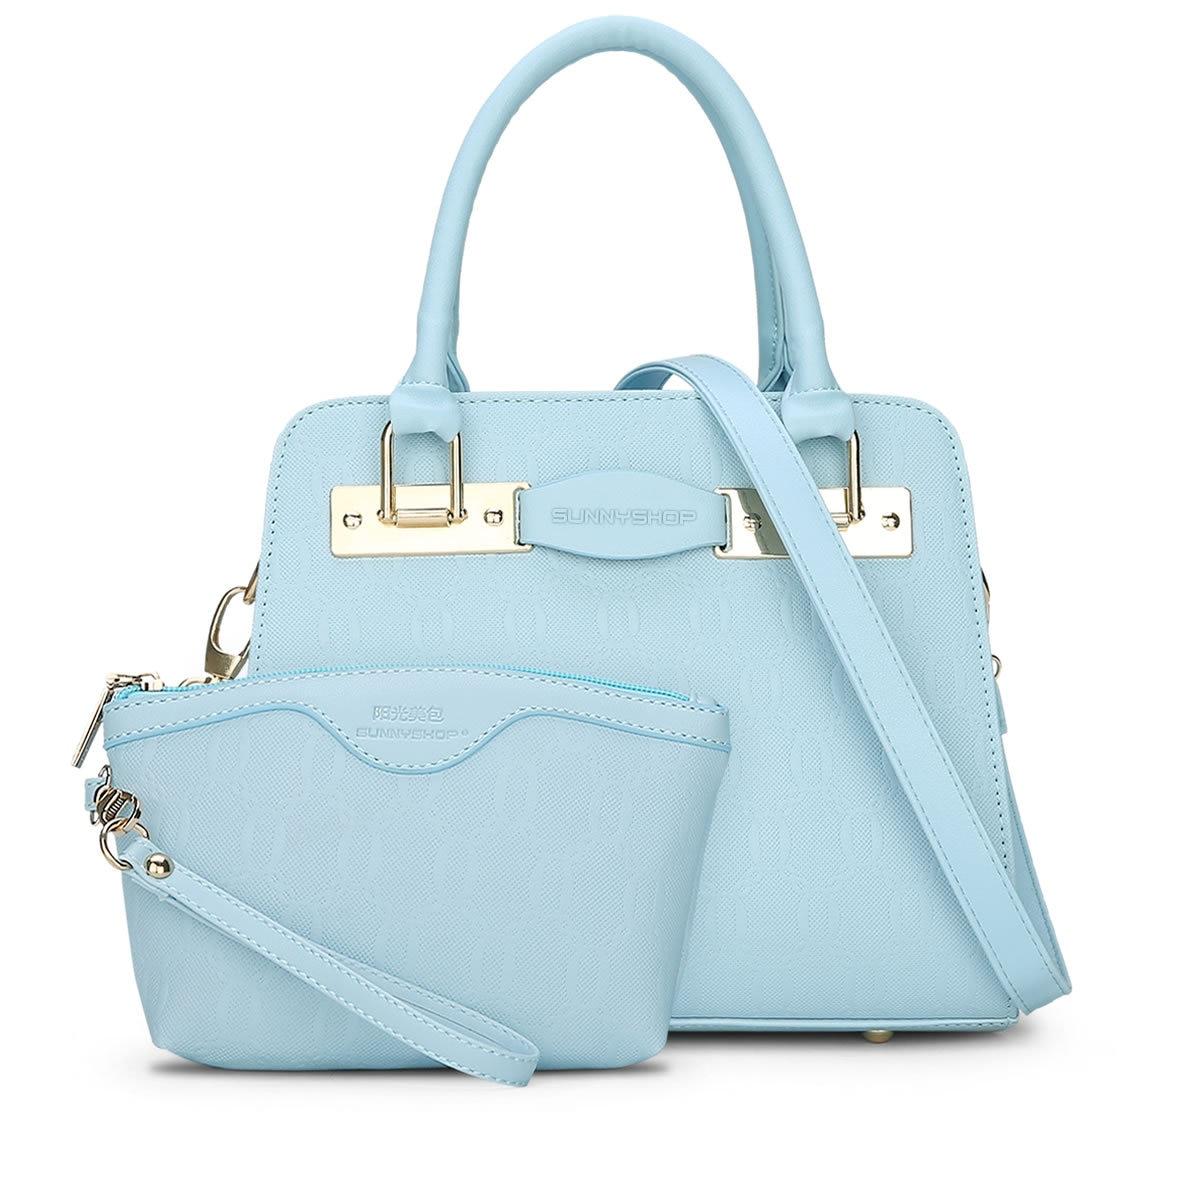 2 BAG/SET  New Fashion Embossed Designer Women Handbags High Quality PU leather Women Shoulder Bags  Women Bags Q5